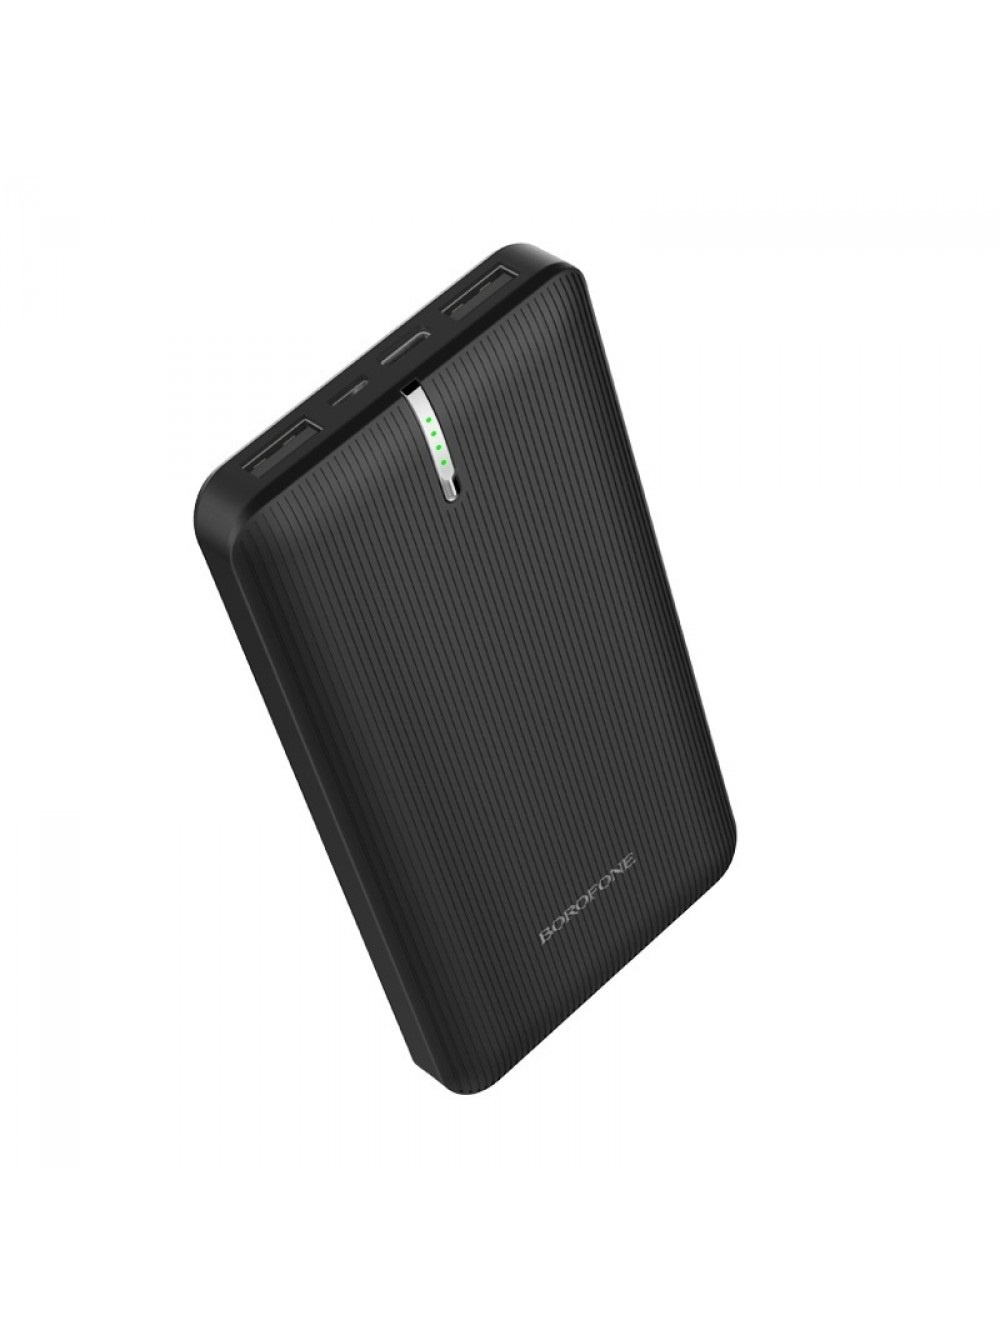 Фото - Внешний аккумулятор Borofone BT18A Prosperous mobile power bank 13000mAh Black внешний аккумулятор power bank 13000 мач buro ra 13000 qc3 0 черный